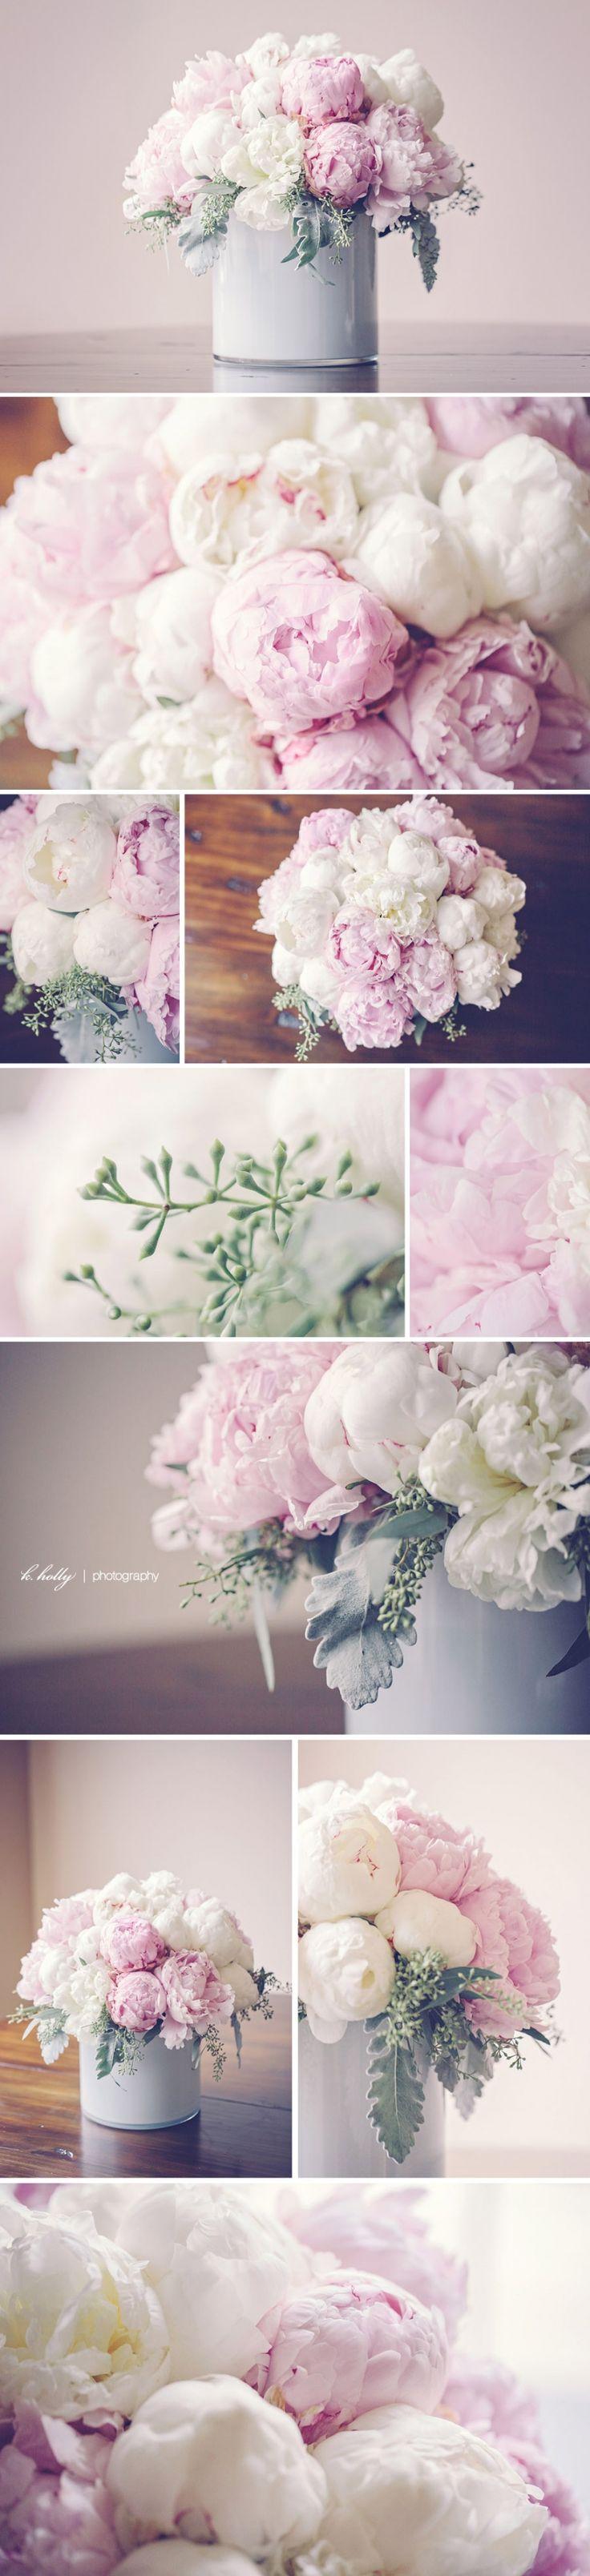 bridal bouquet birthday pink white chilean peony ice cream flowers